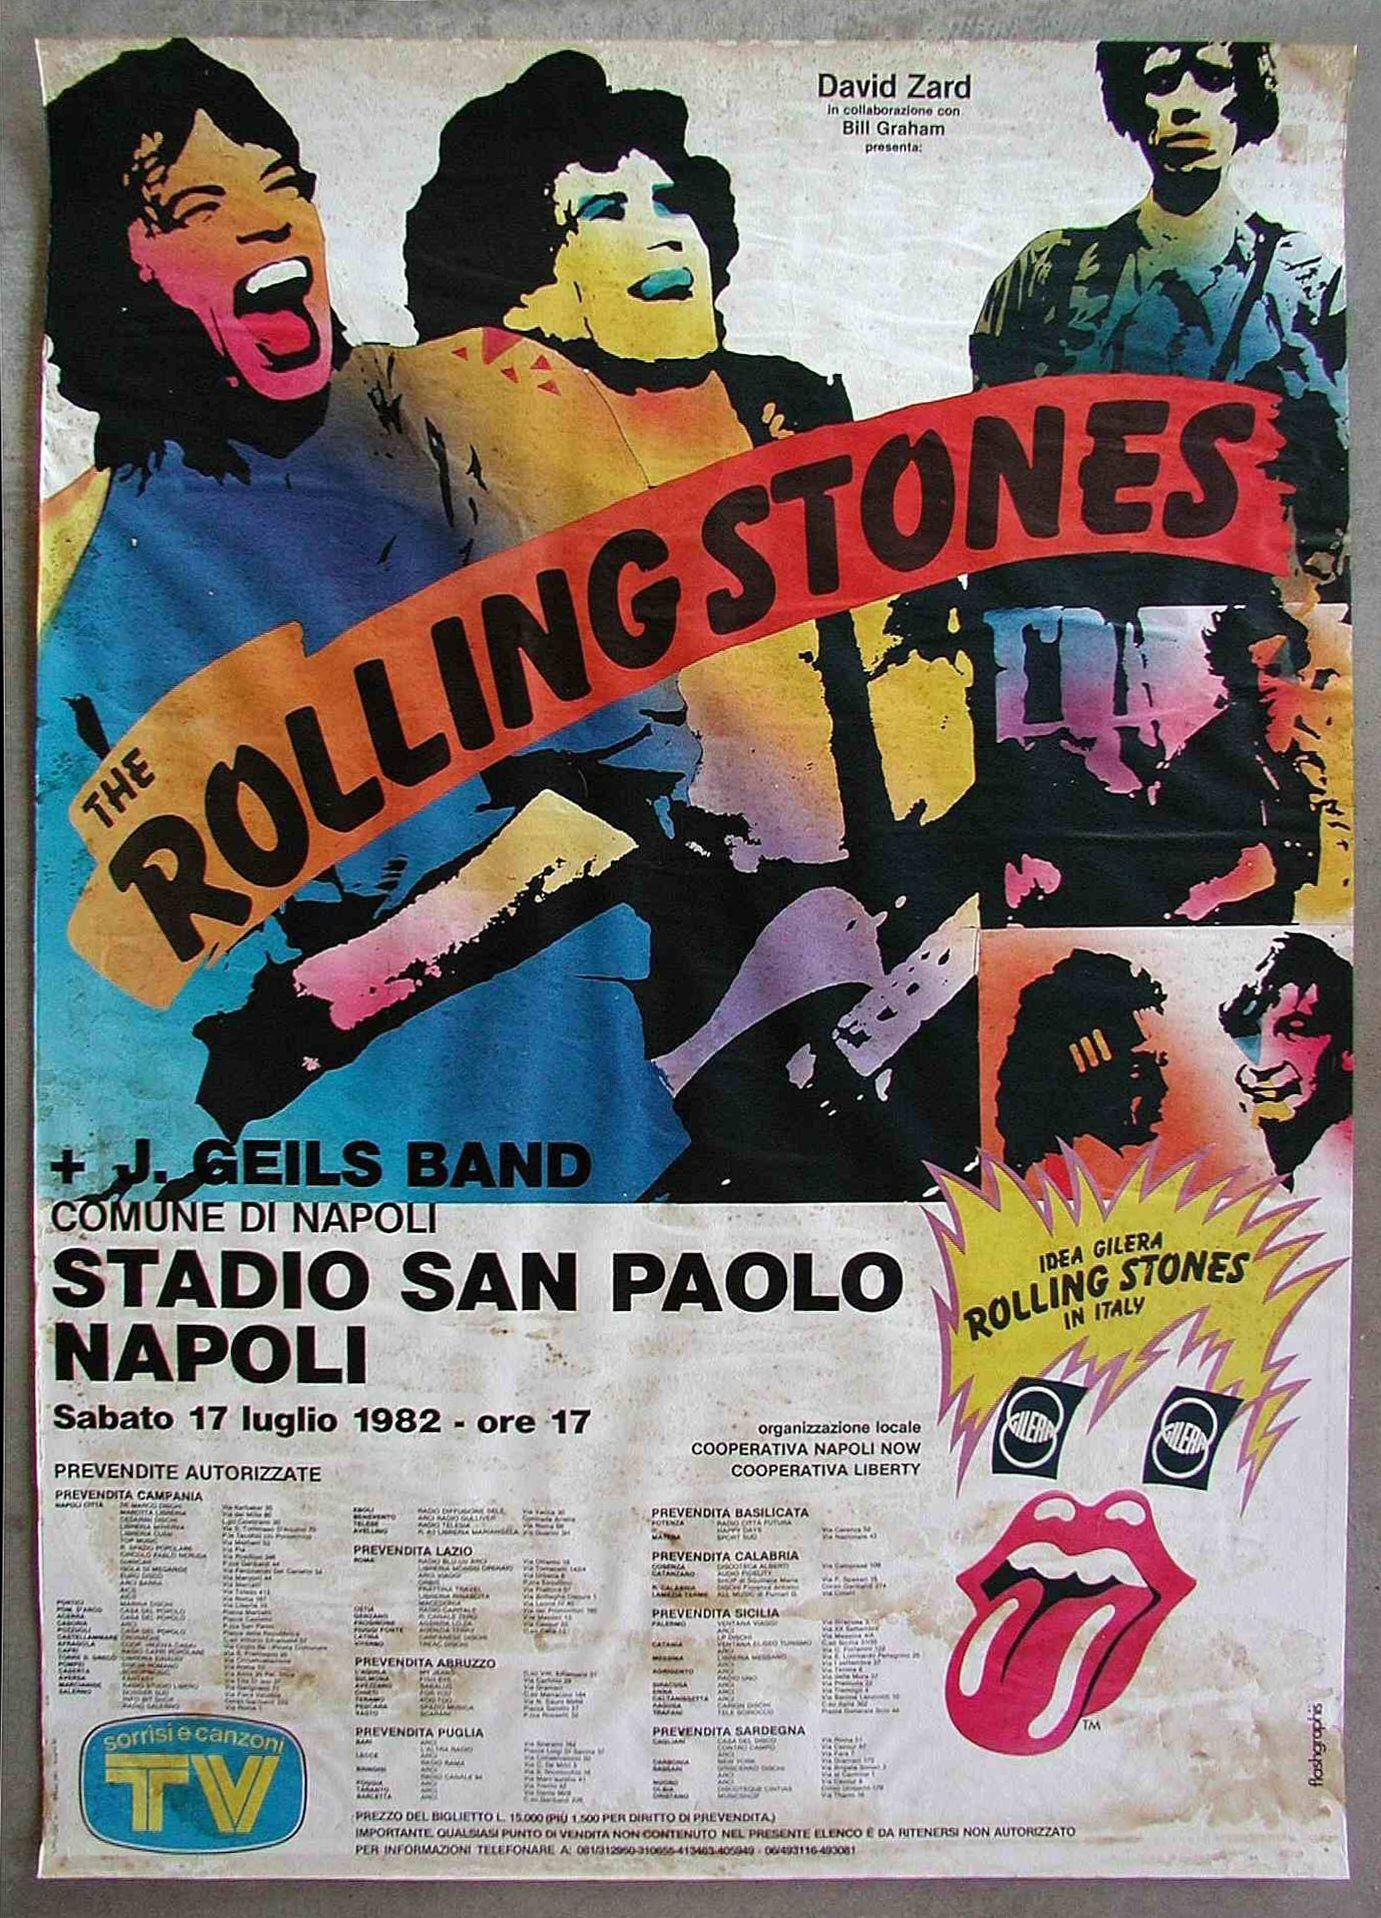 Rolling Stones, J.Geils Band Tour 1973